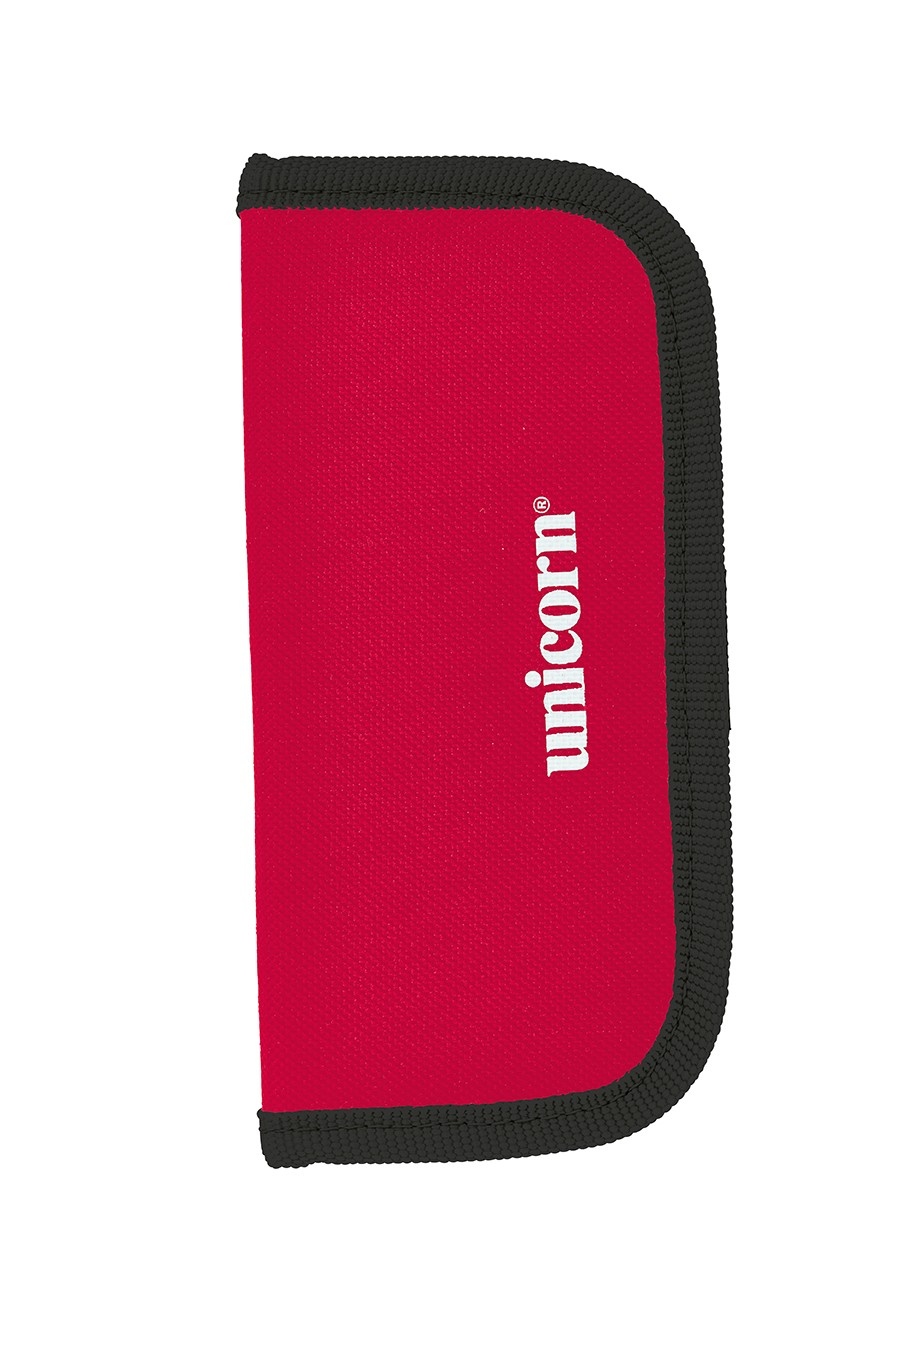 Midi Velcro Wallet - Red/Black